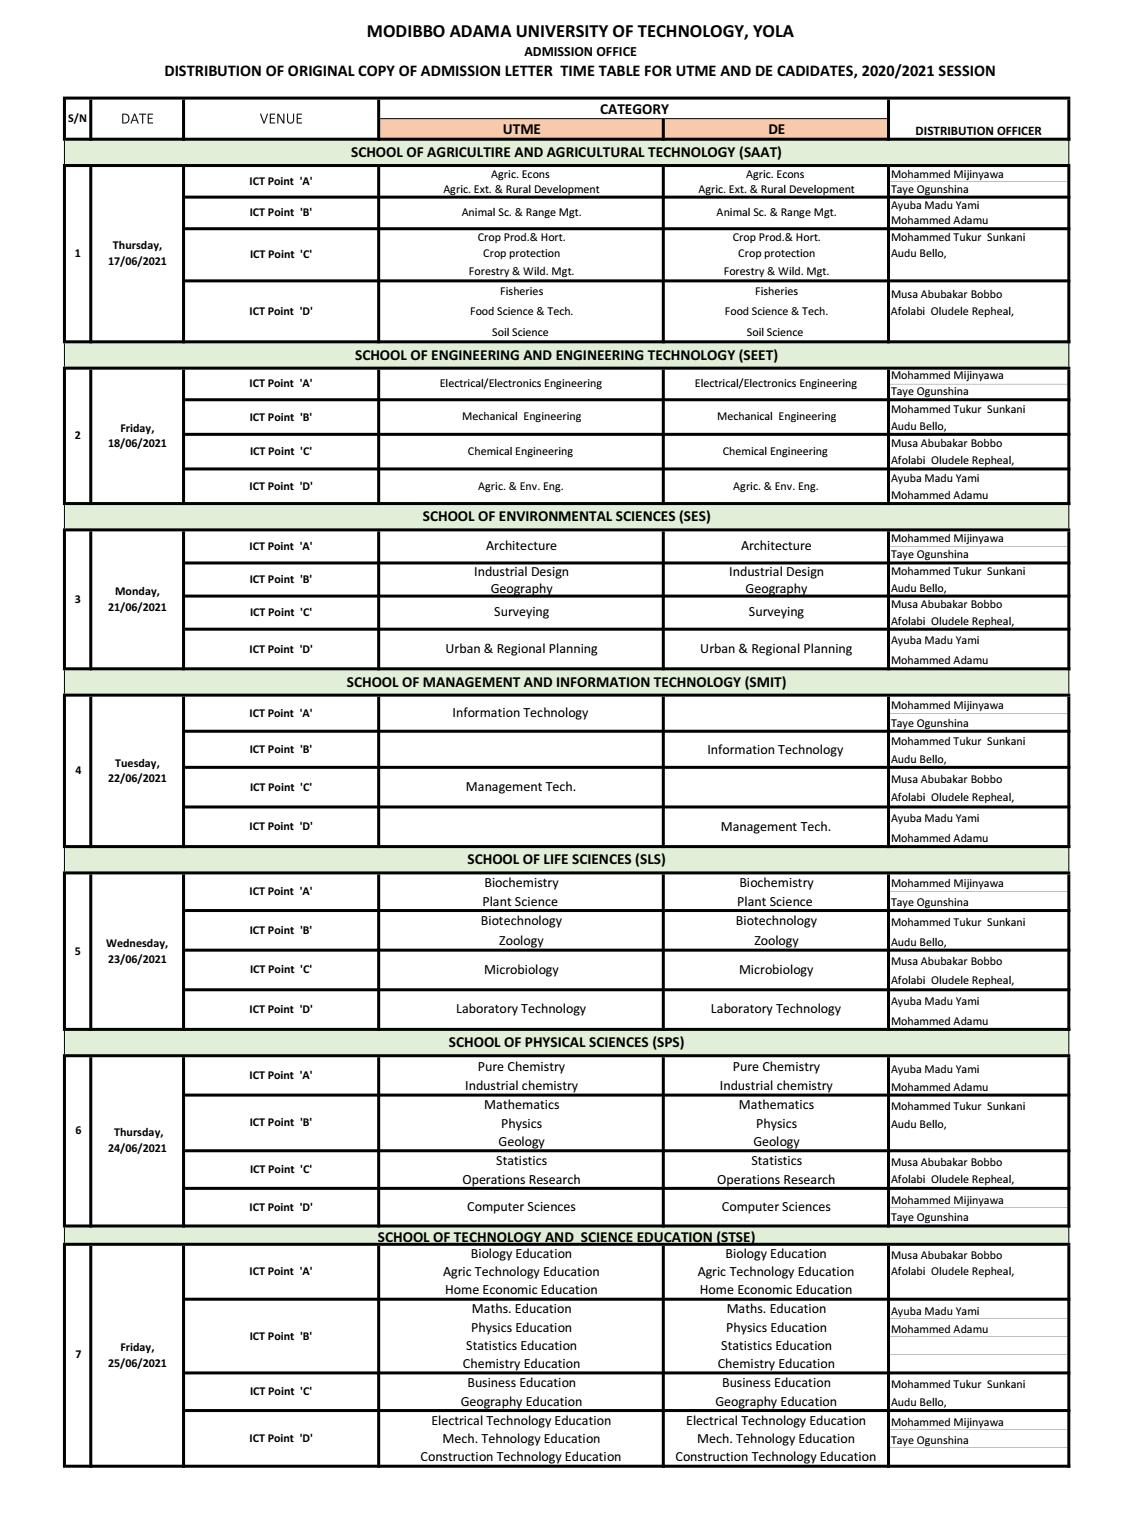 MAUTECH Original Admission Letter Collection Timetable 2020/2021